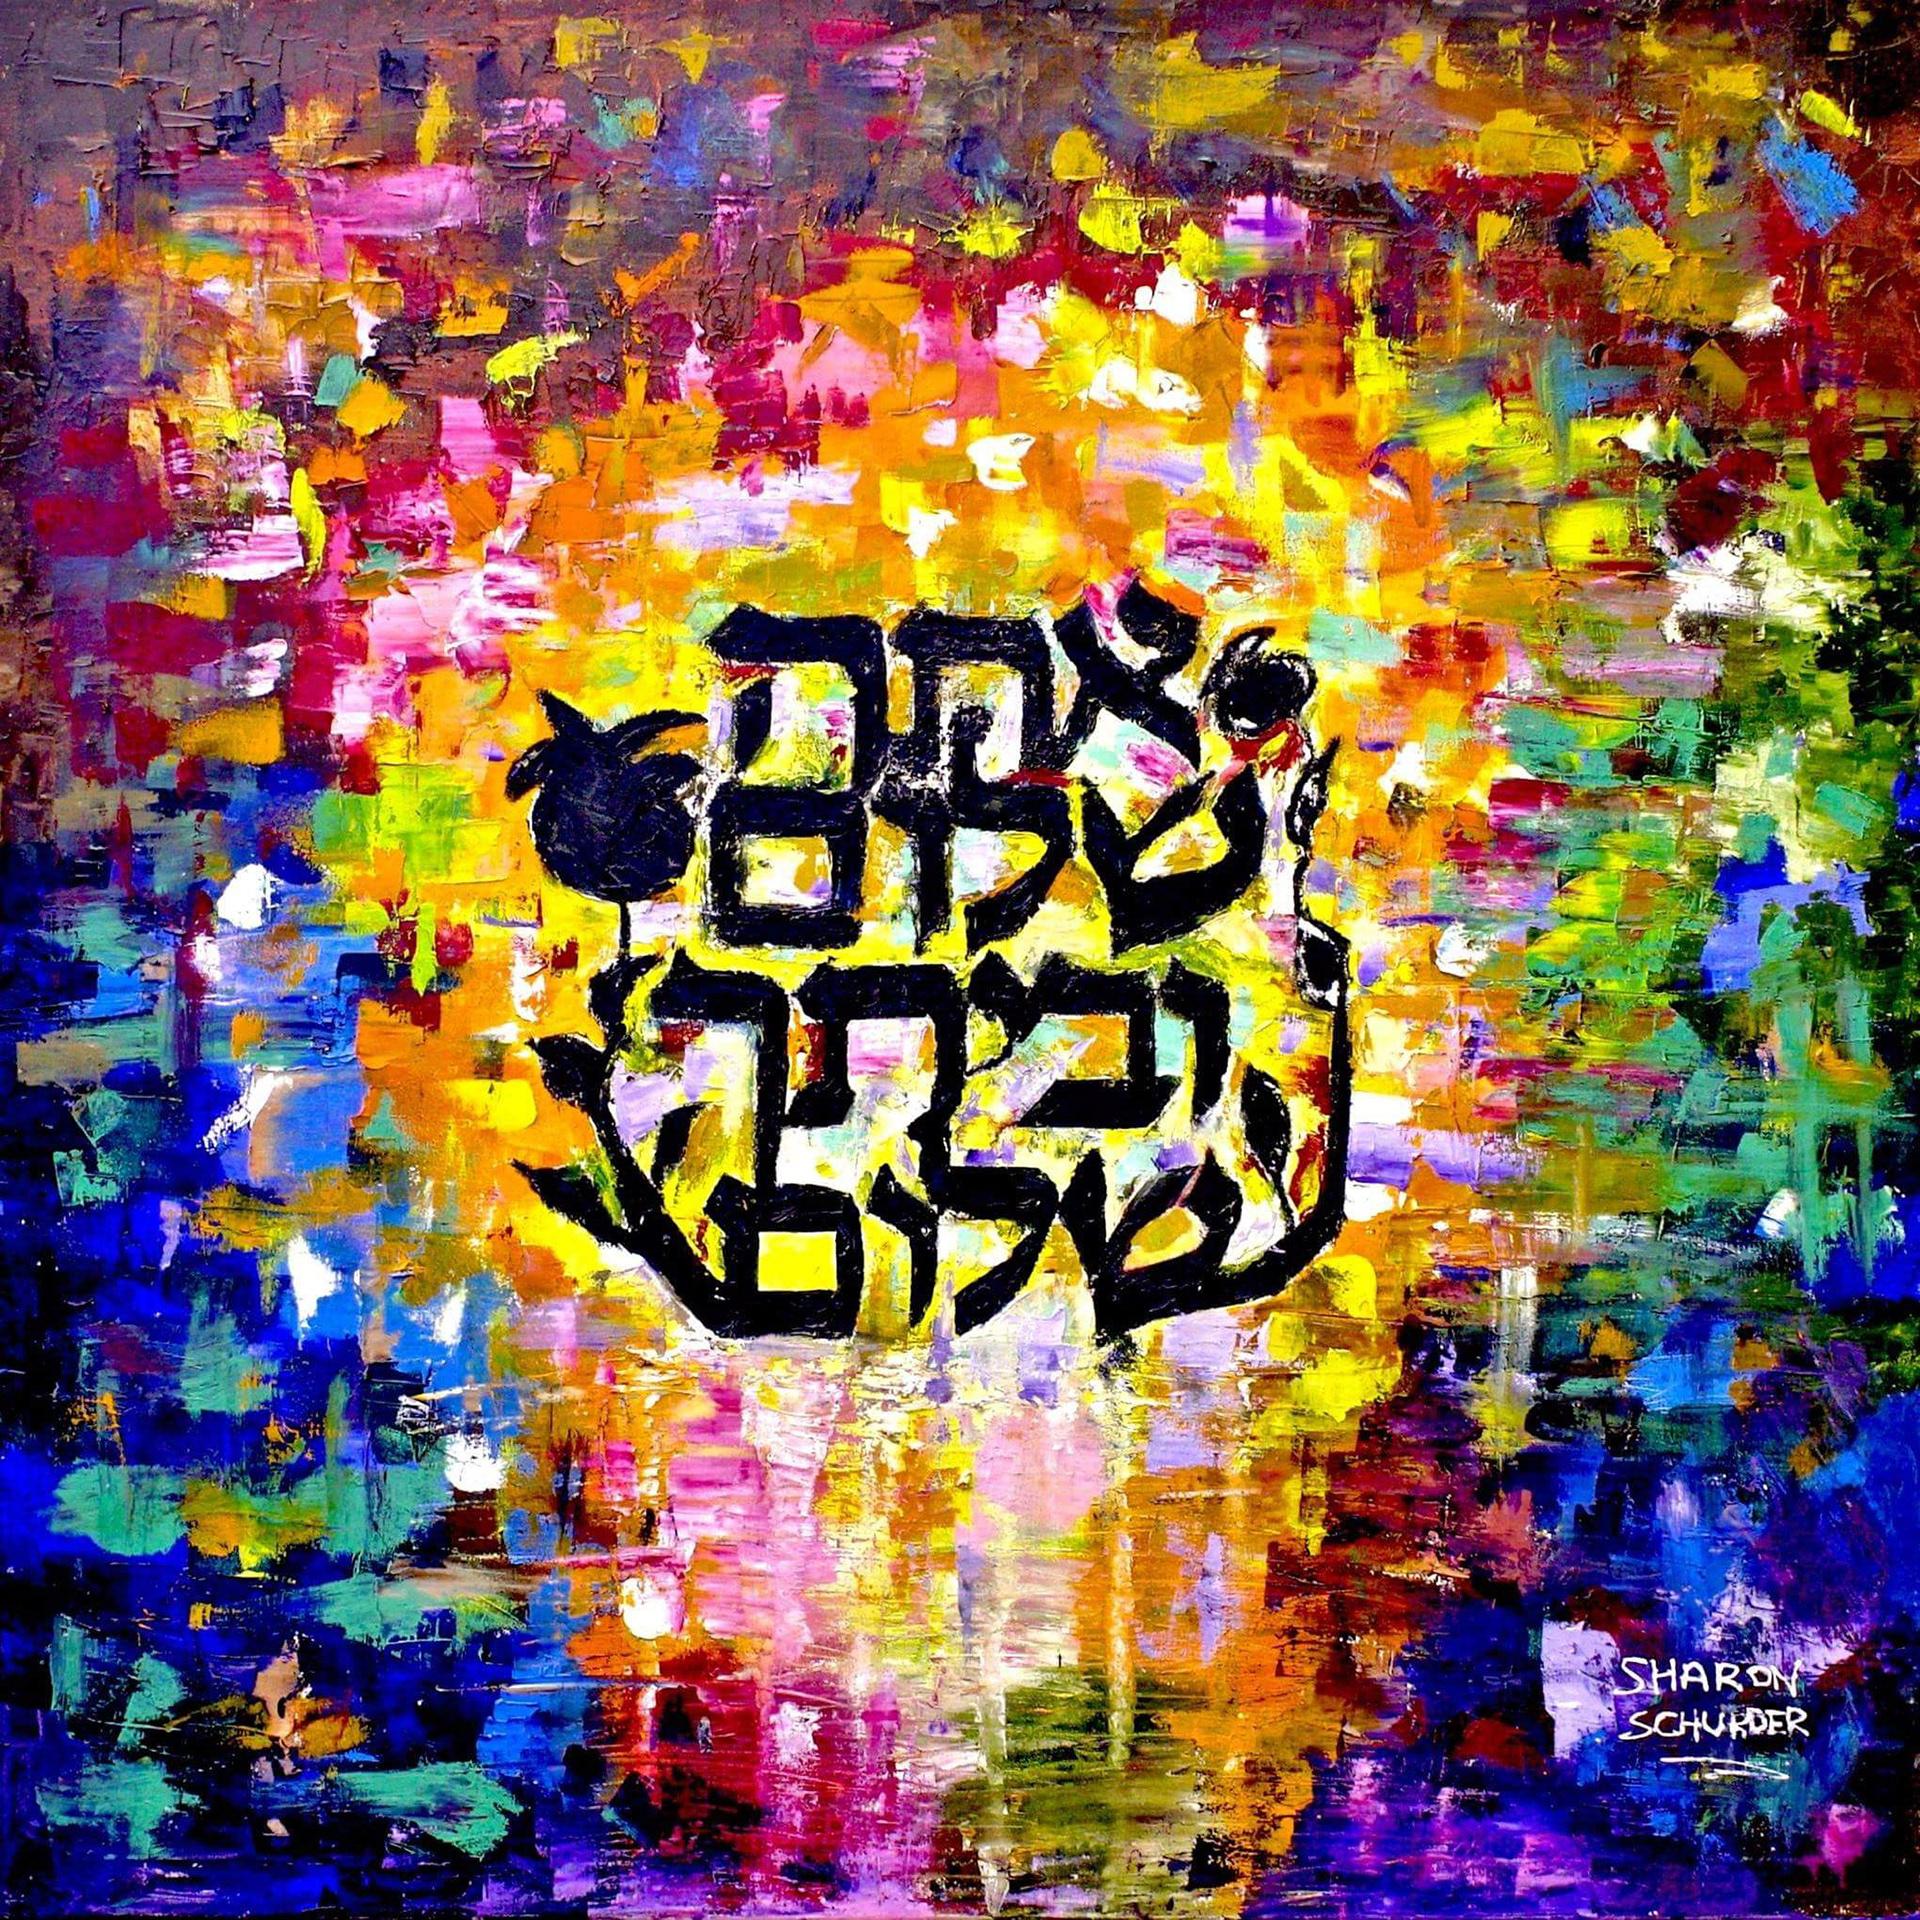 Sharon Schurder Original Jewish Art - Ata Sholom